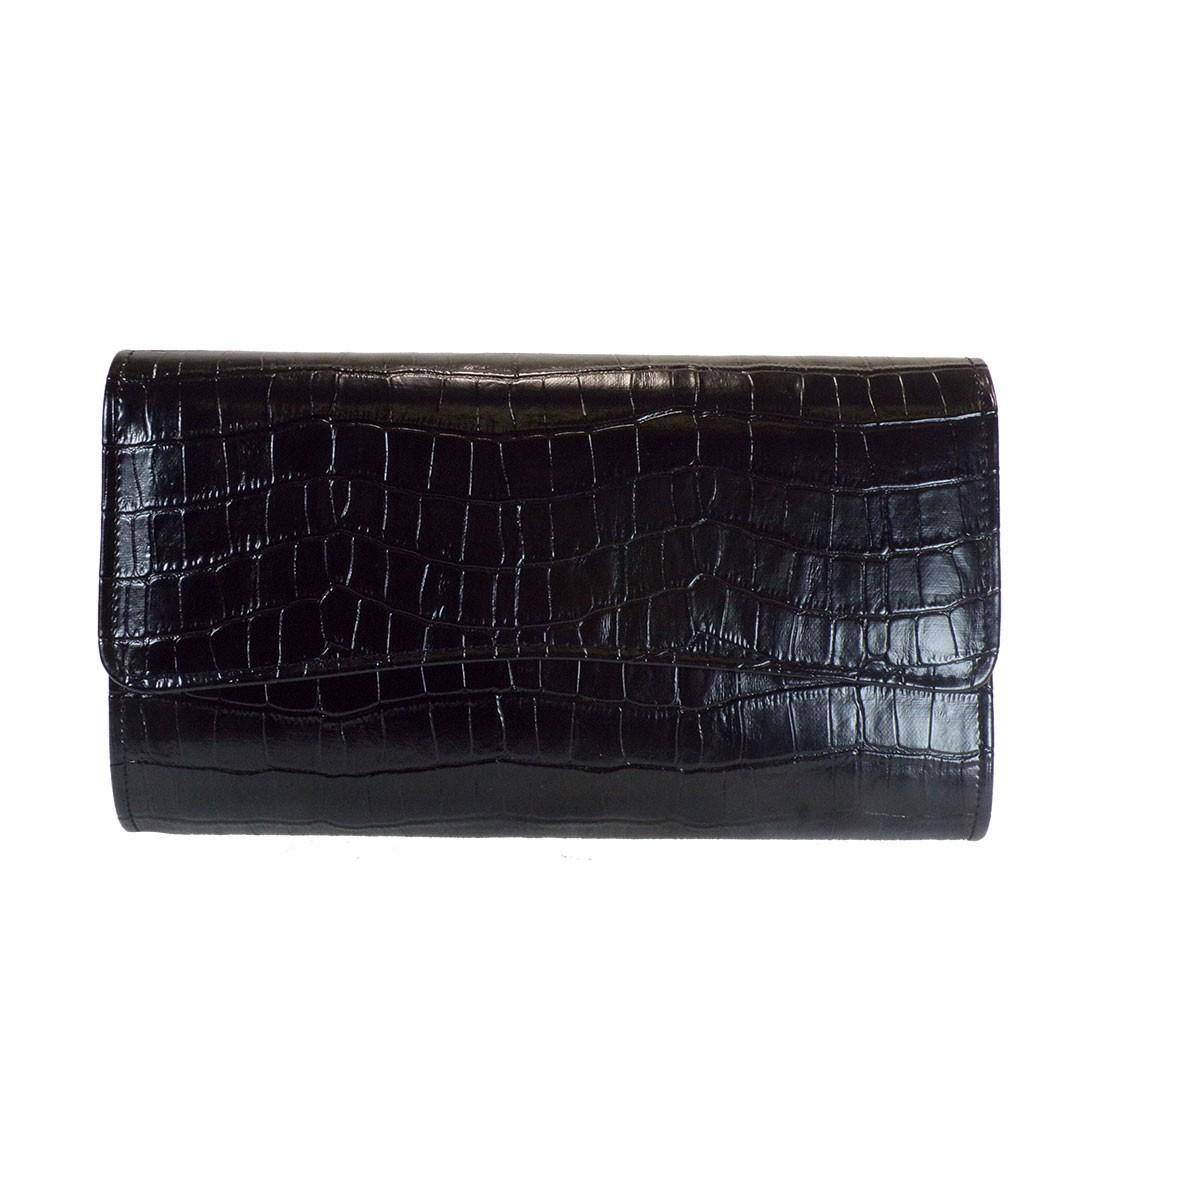 Bagiota Shoes Bags Γυναικεία Βραδινά Τσαντάκια 1017-Μαύρο Kροκό